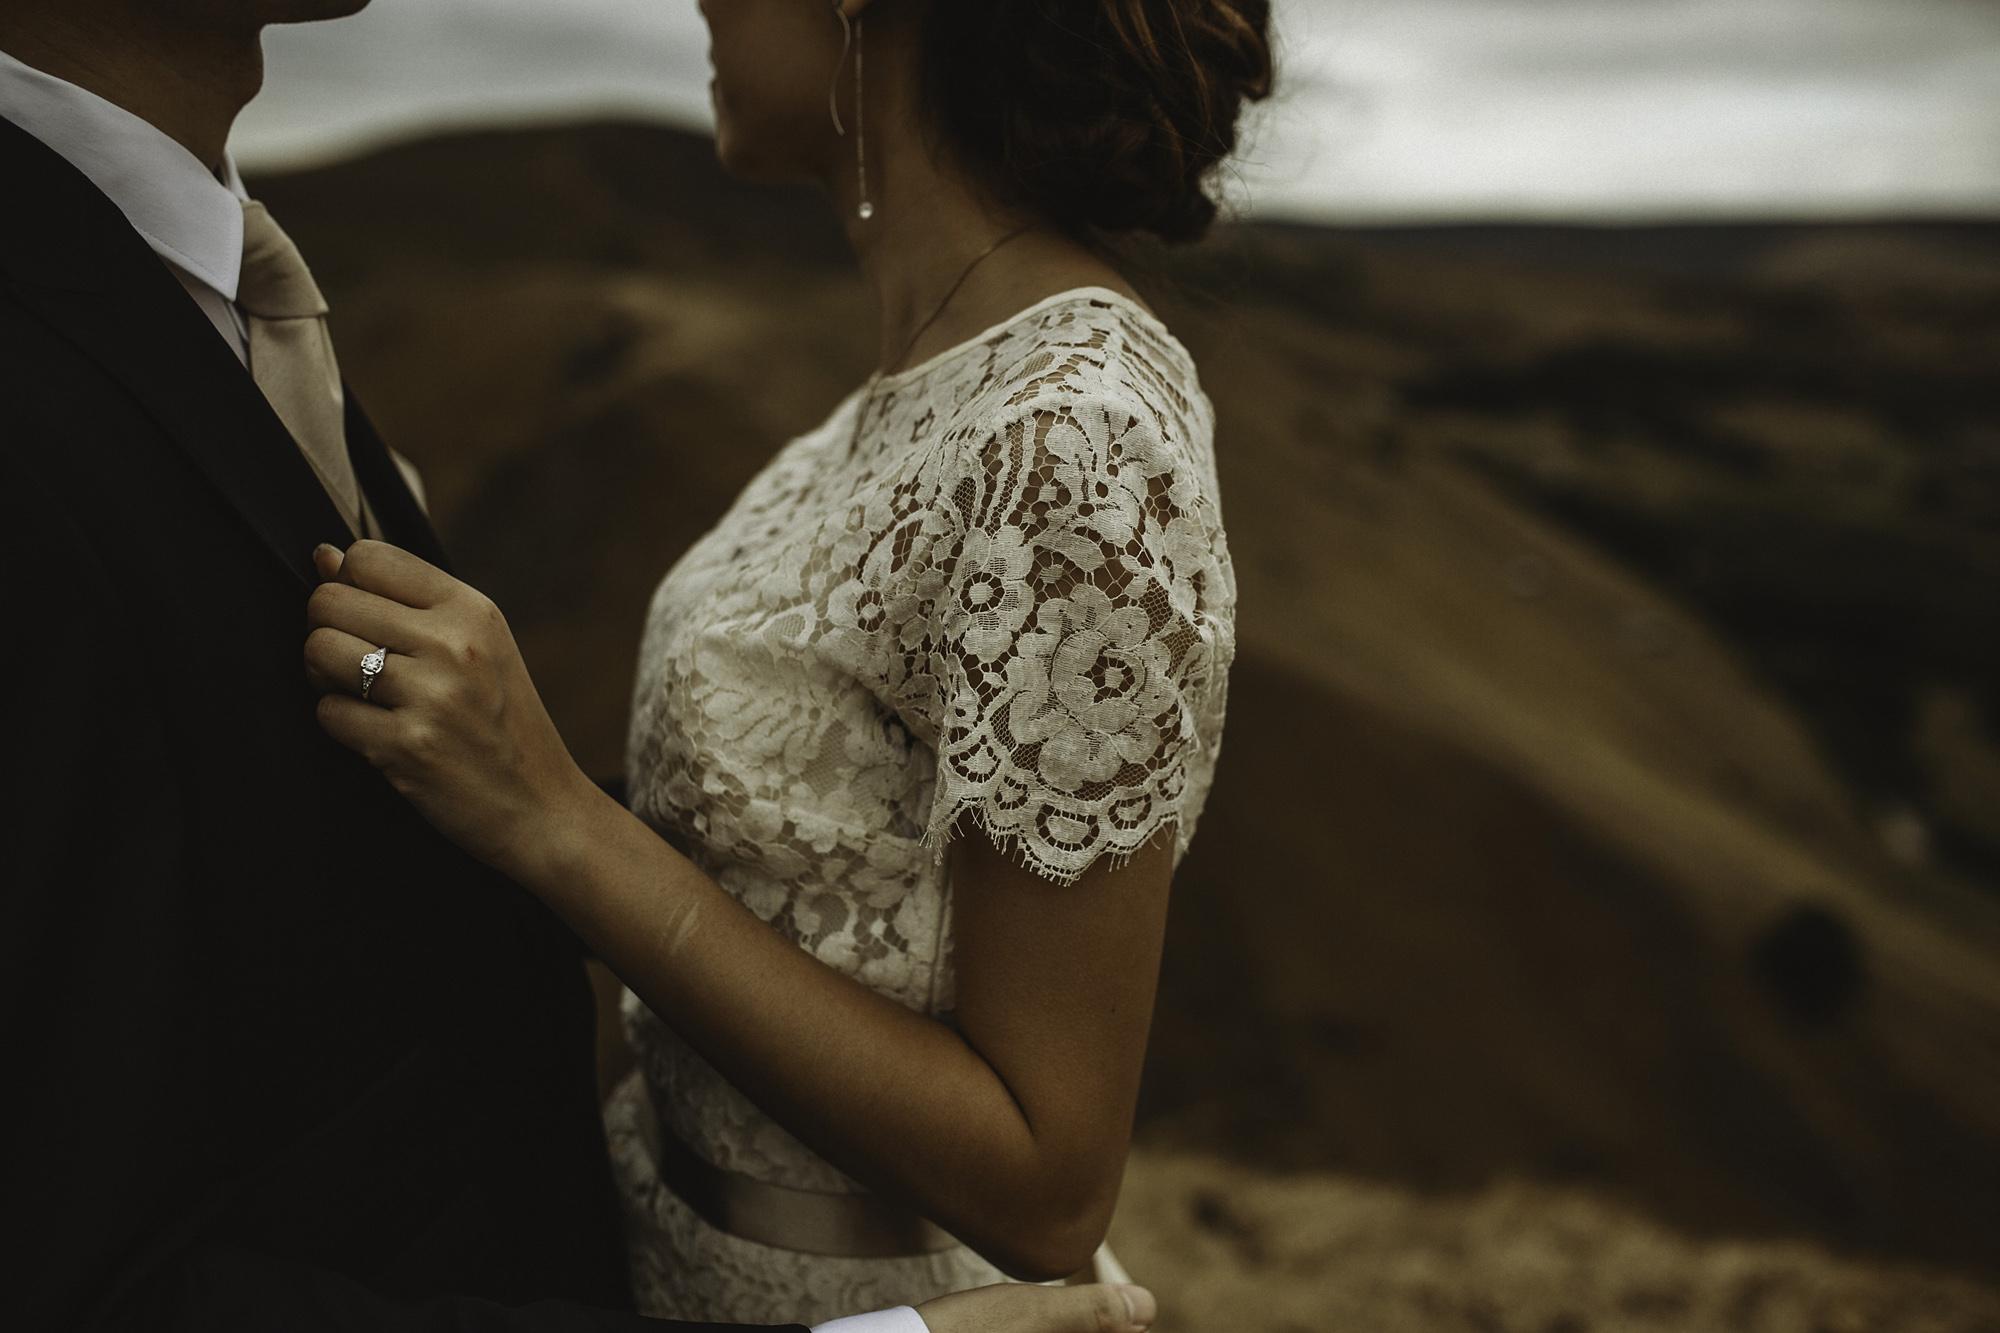 Kate-Beaumont-Wedding-Dress-Bridal-Separates-Peak-District-Shoot-11.jpg